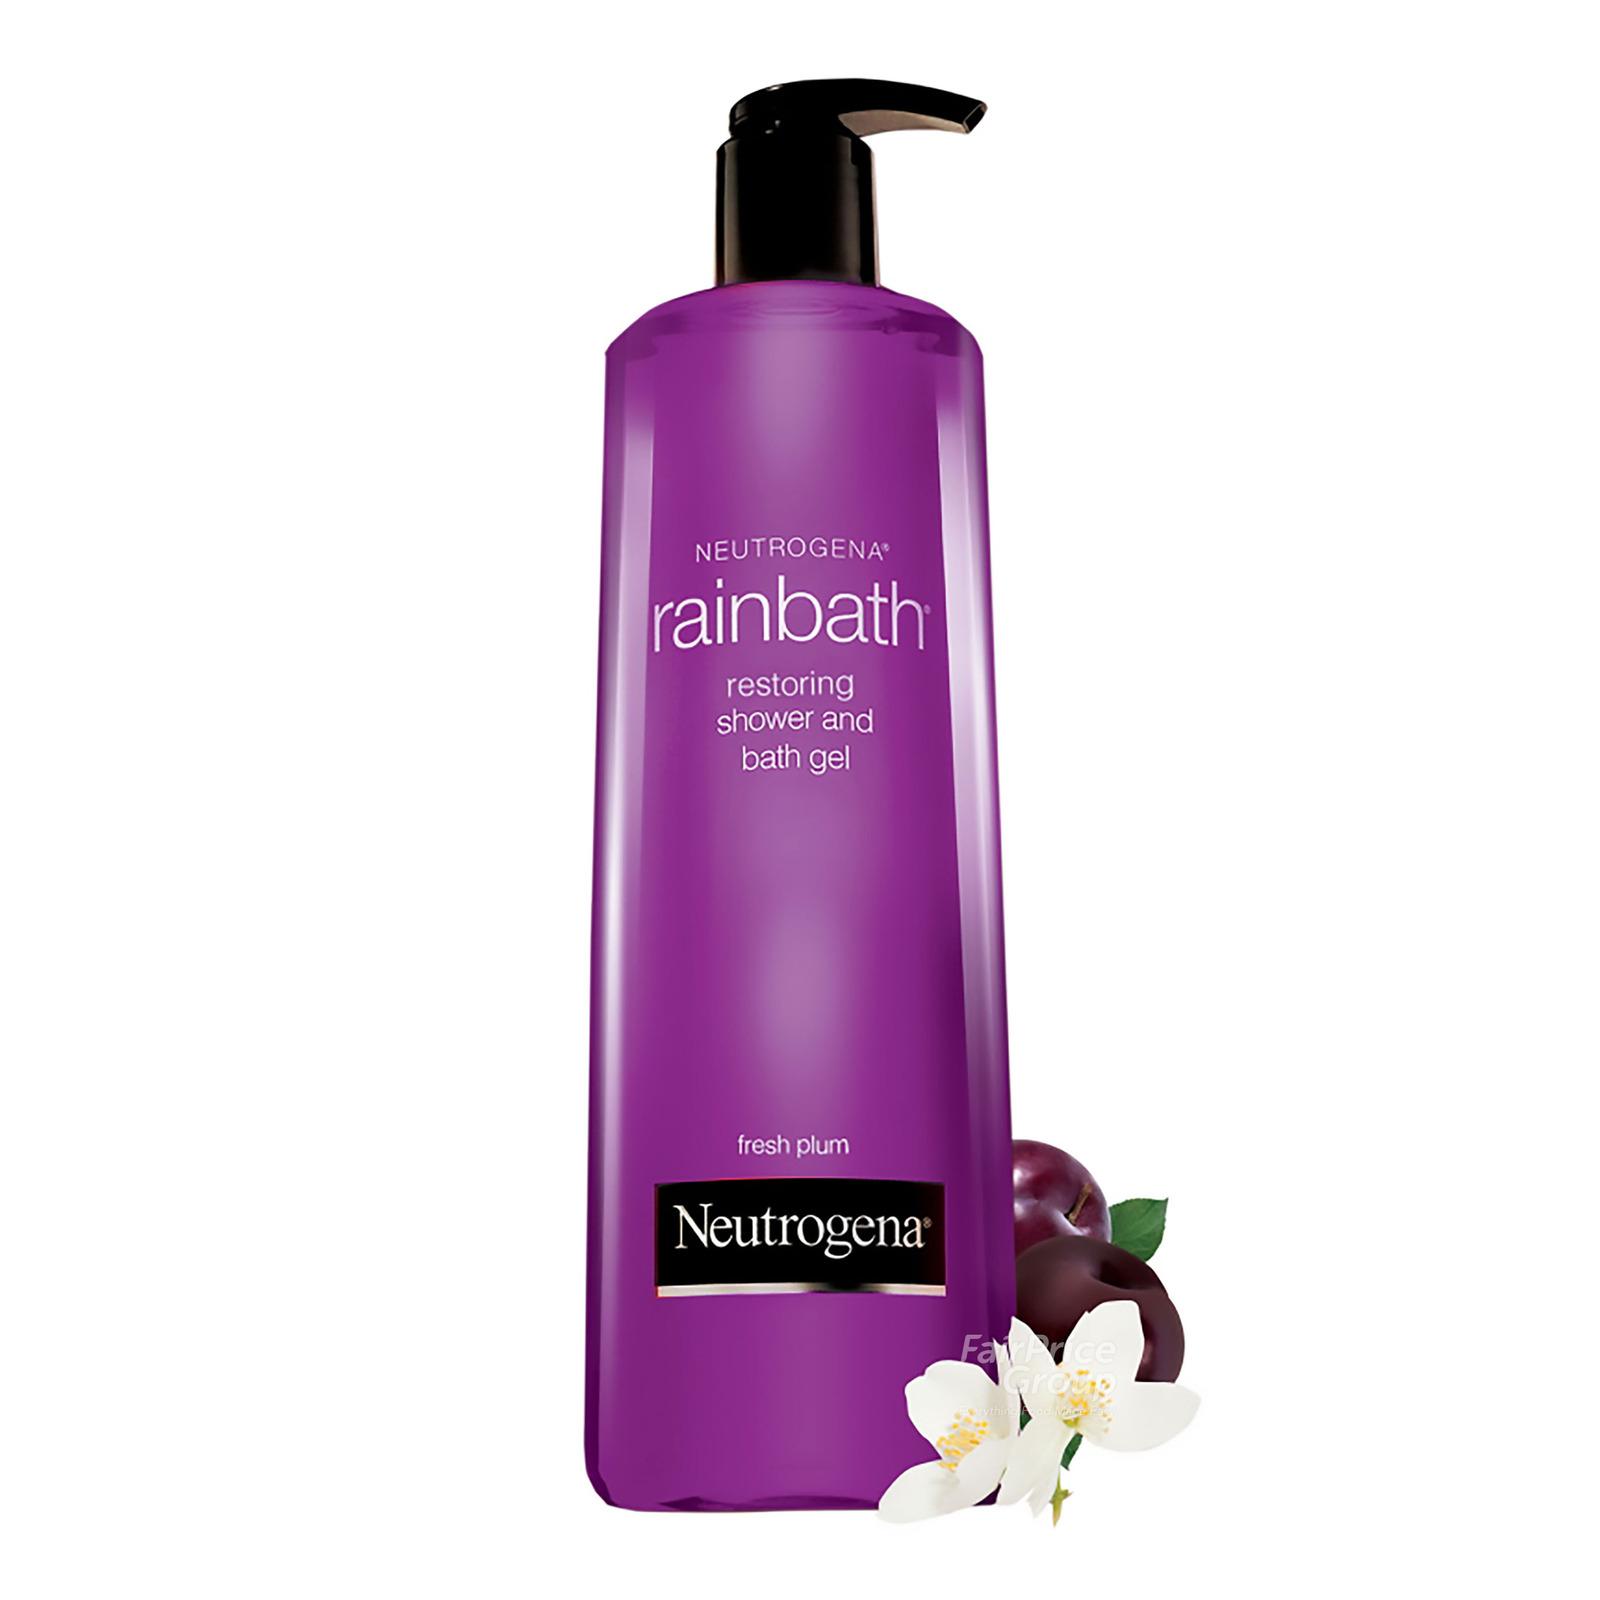 Neutrogena Restroing Shower & Bath Gel - Fresh Plum